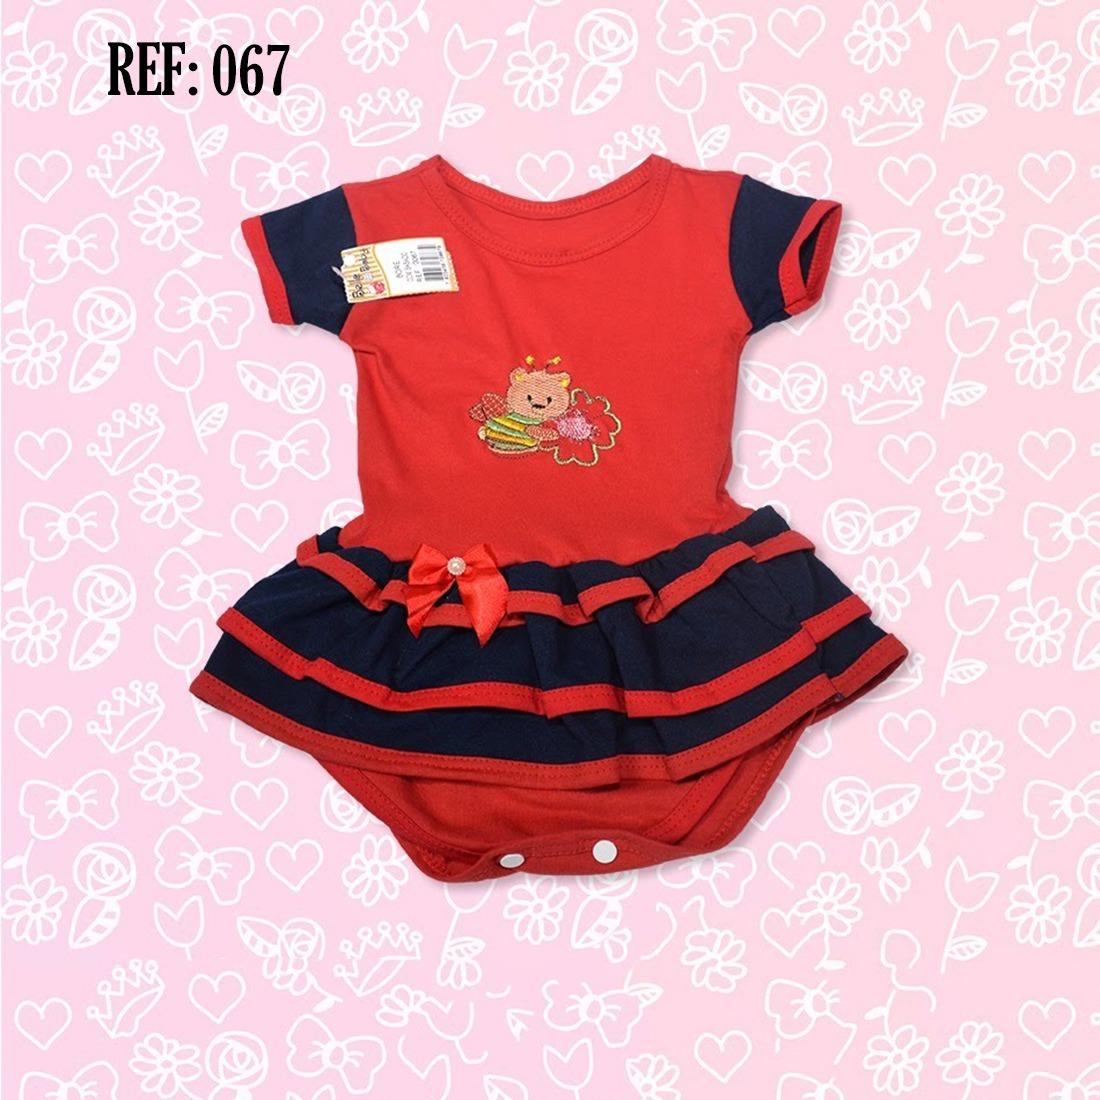 lot c 20pçs roupas de bebe masculino 4 meses. Carregando zoom. 36dd299b882